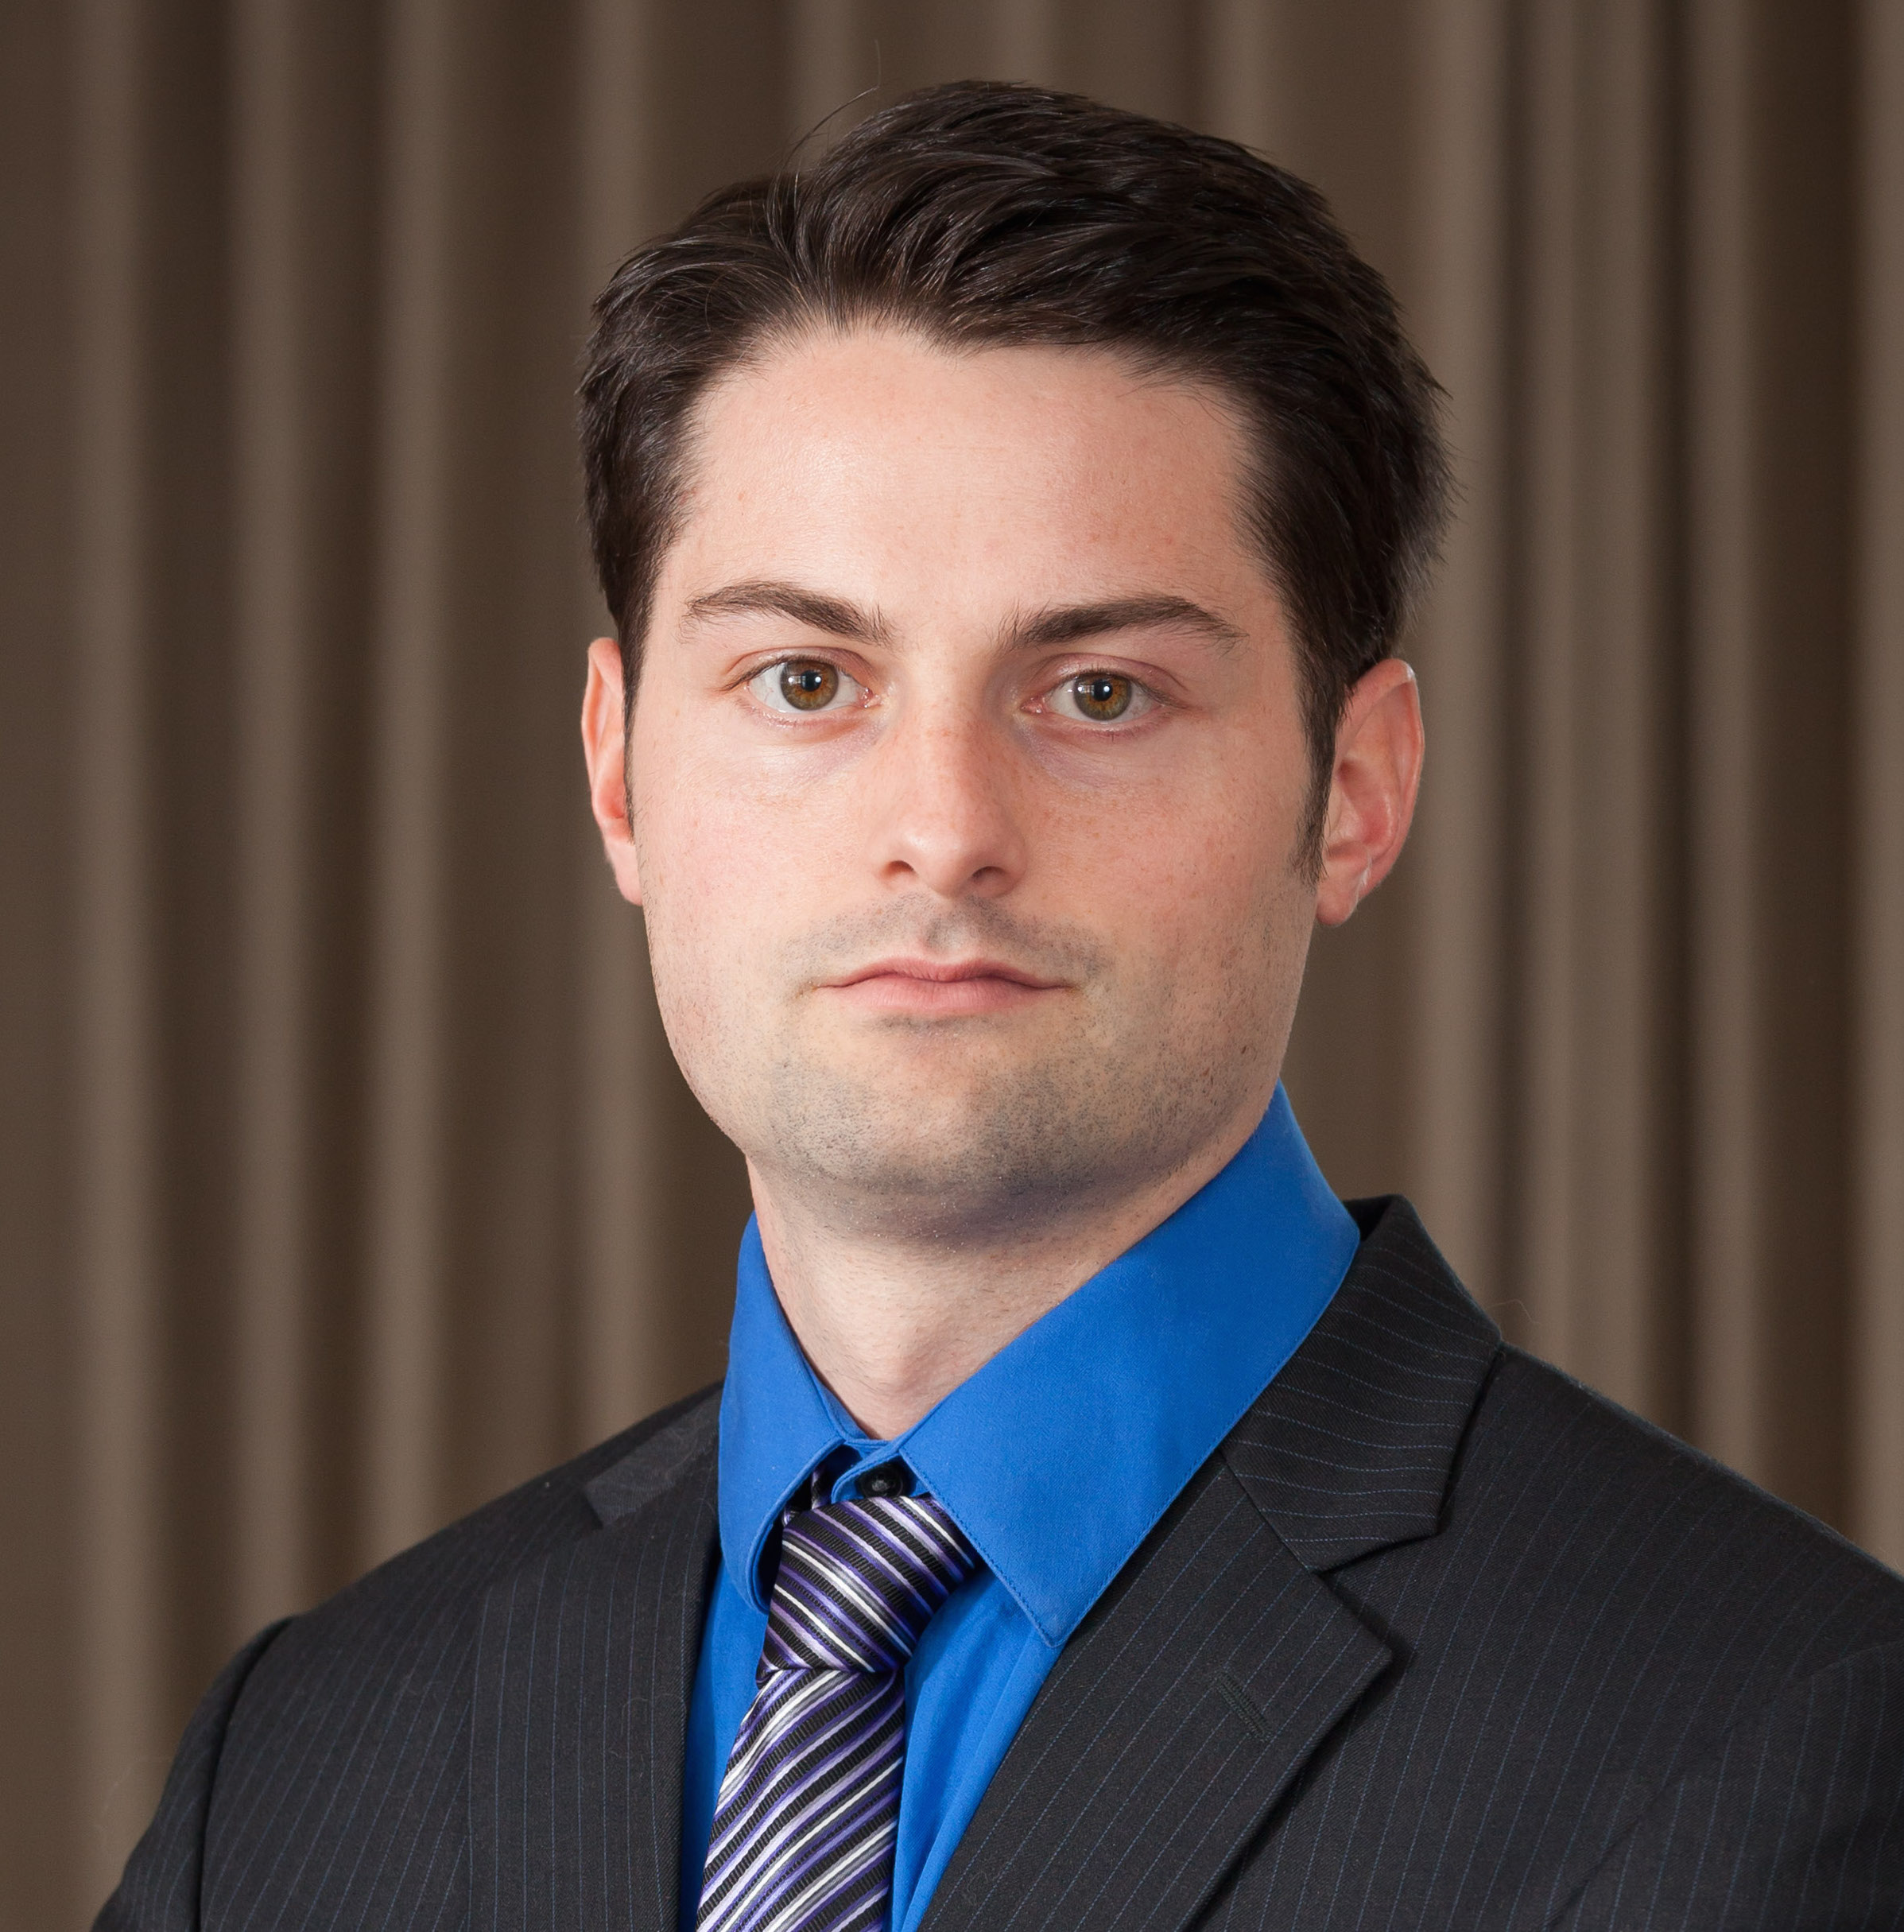 Ryan Modesto